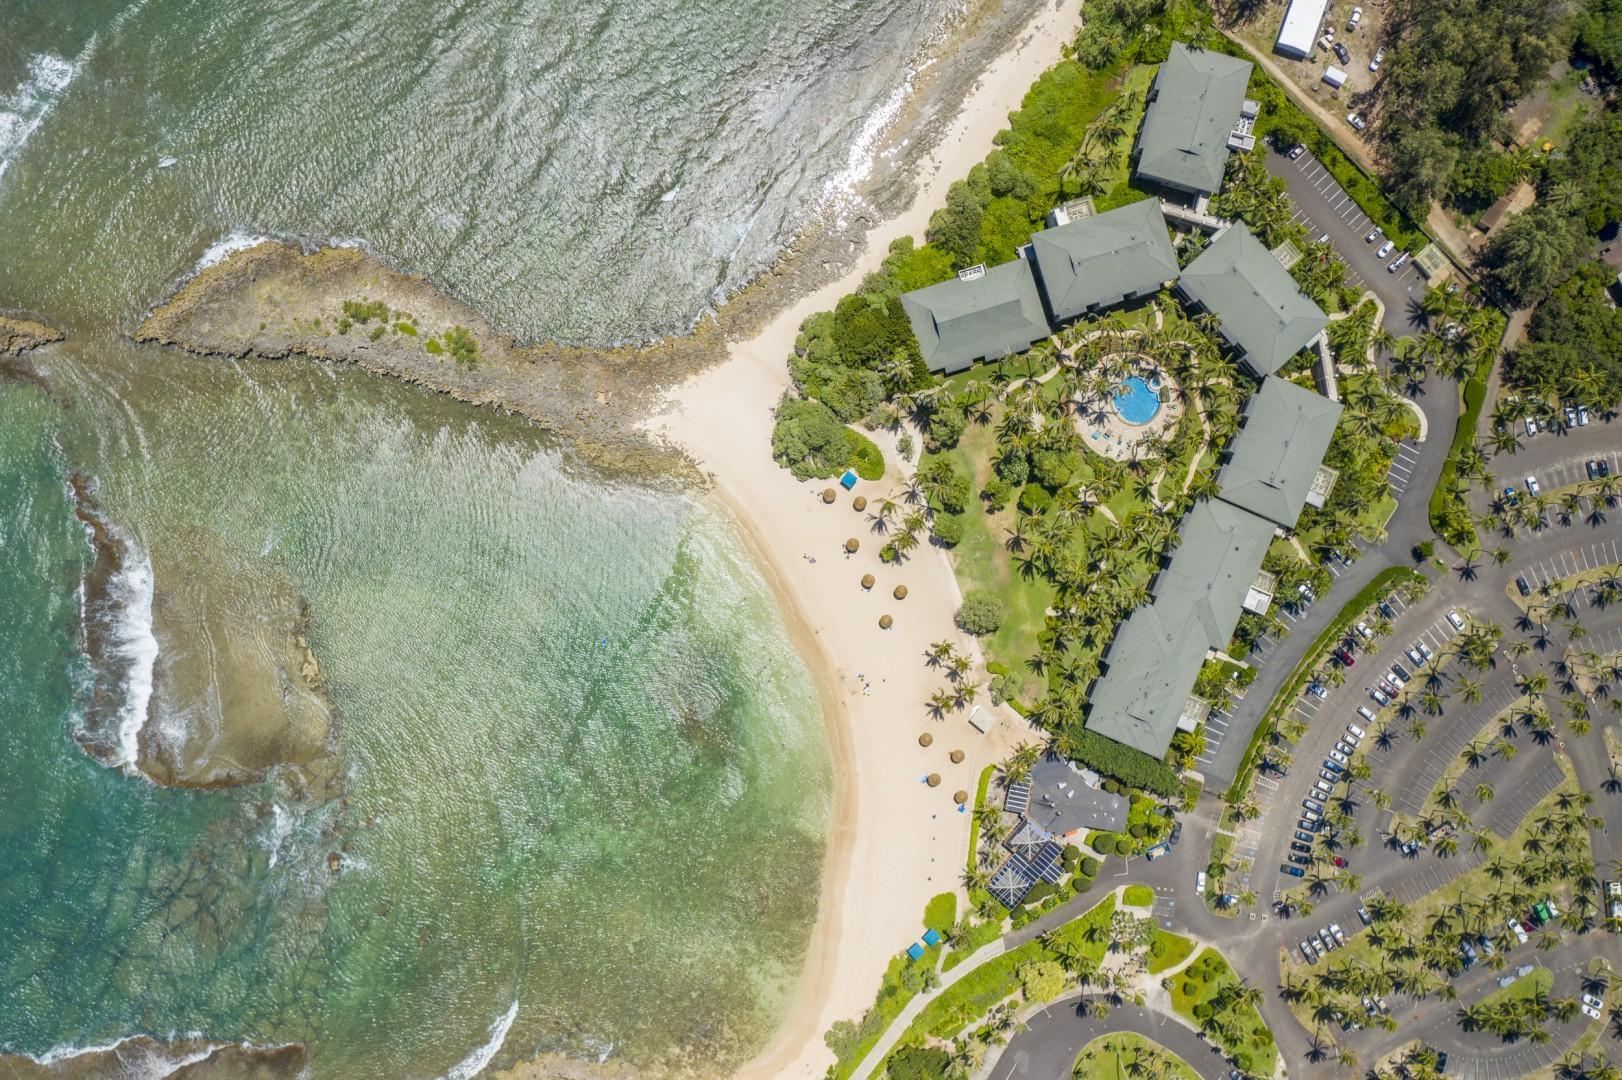 Villas, Turtle Bay Resort and Beaches